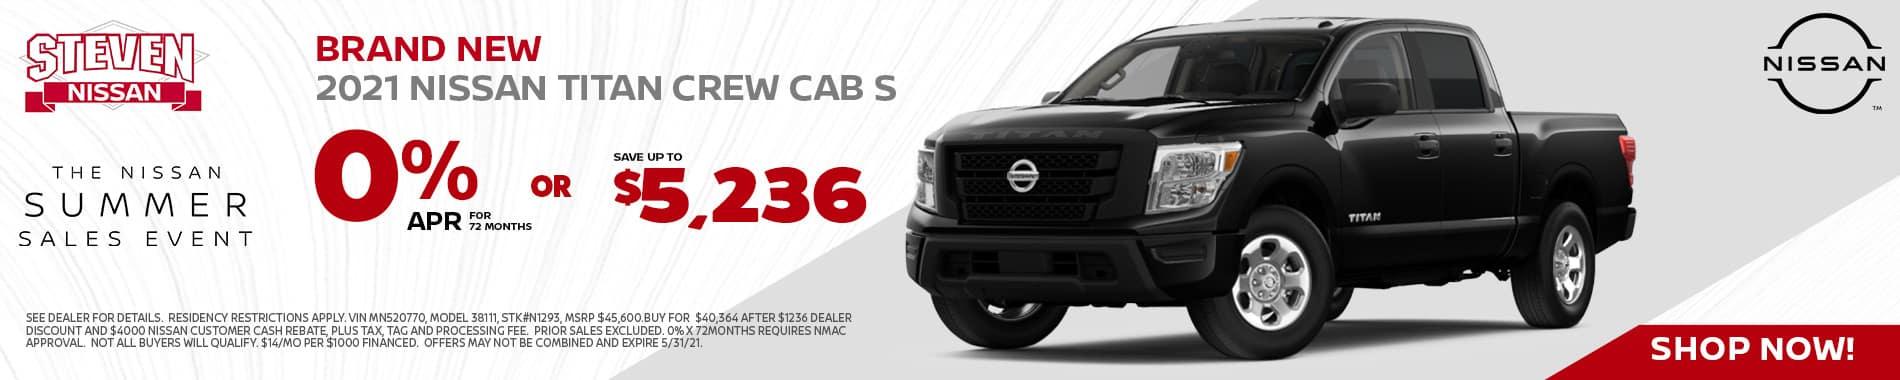 05_21_Steven_Nissan-2021-Nissan-Titan-Crew-Cab-S